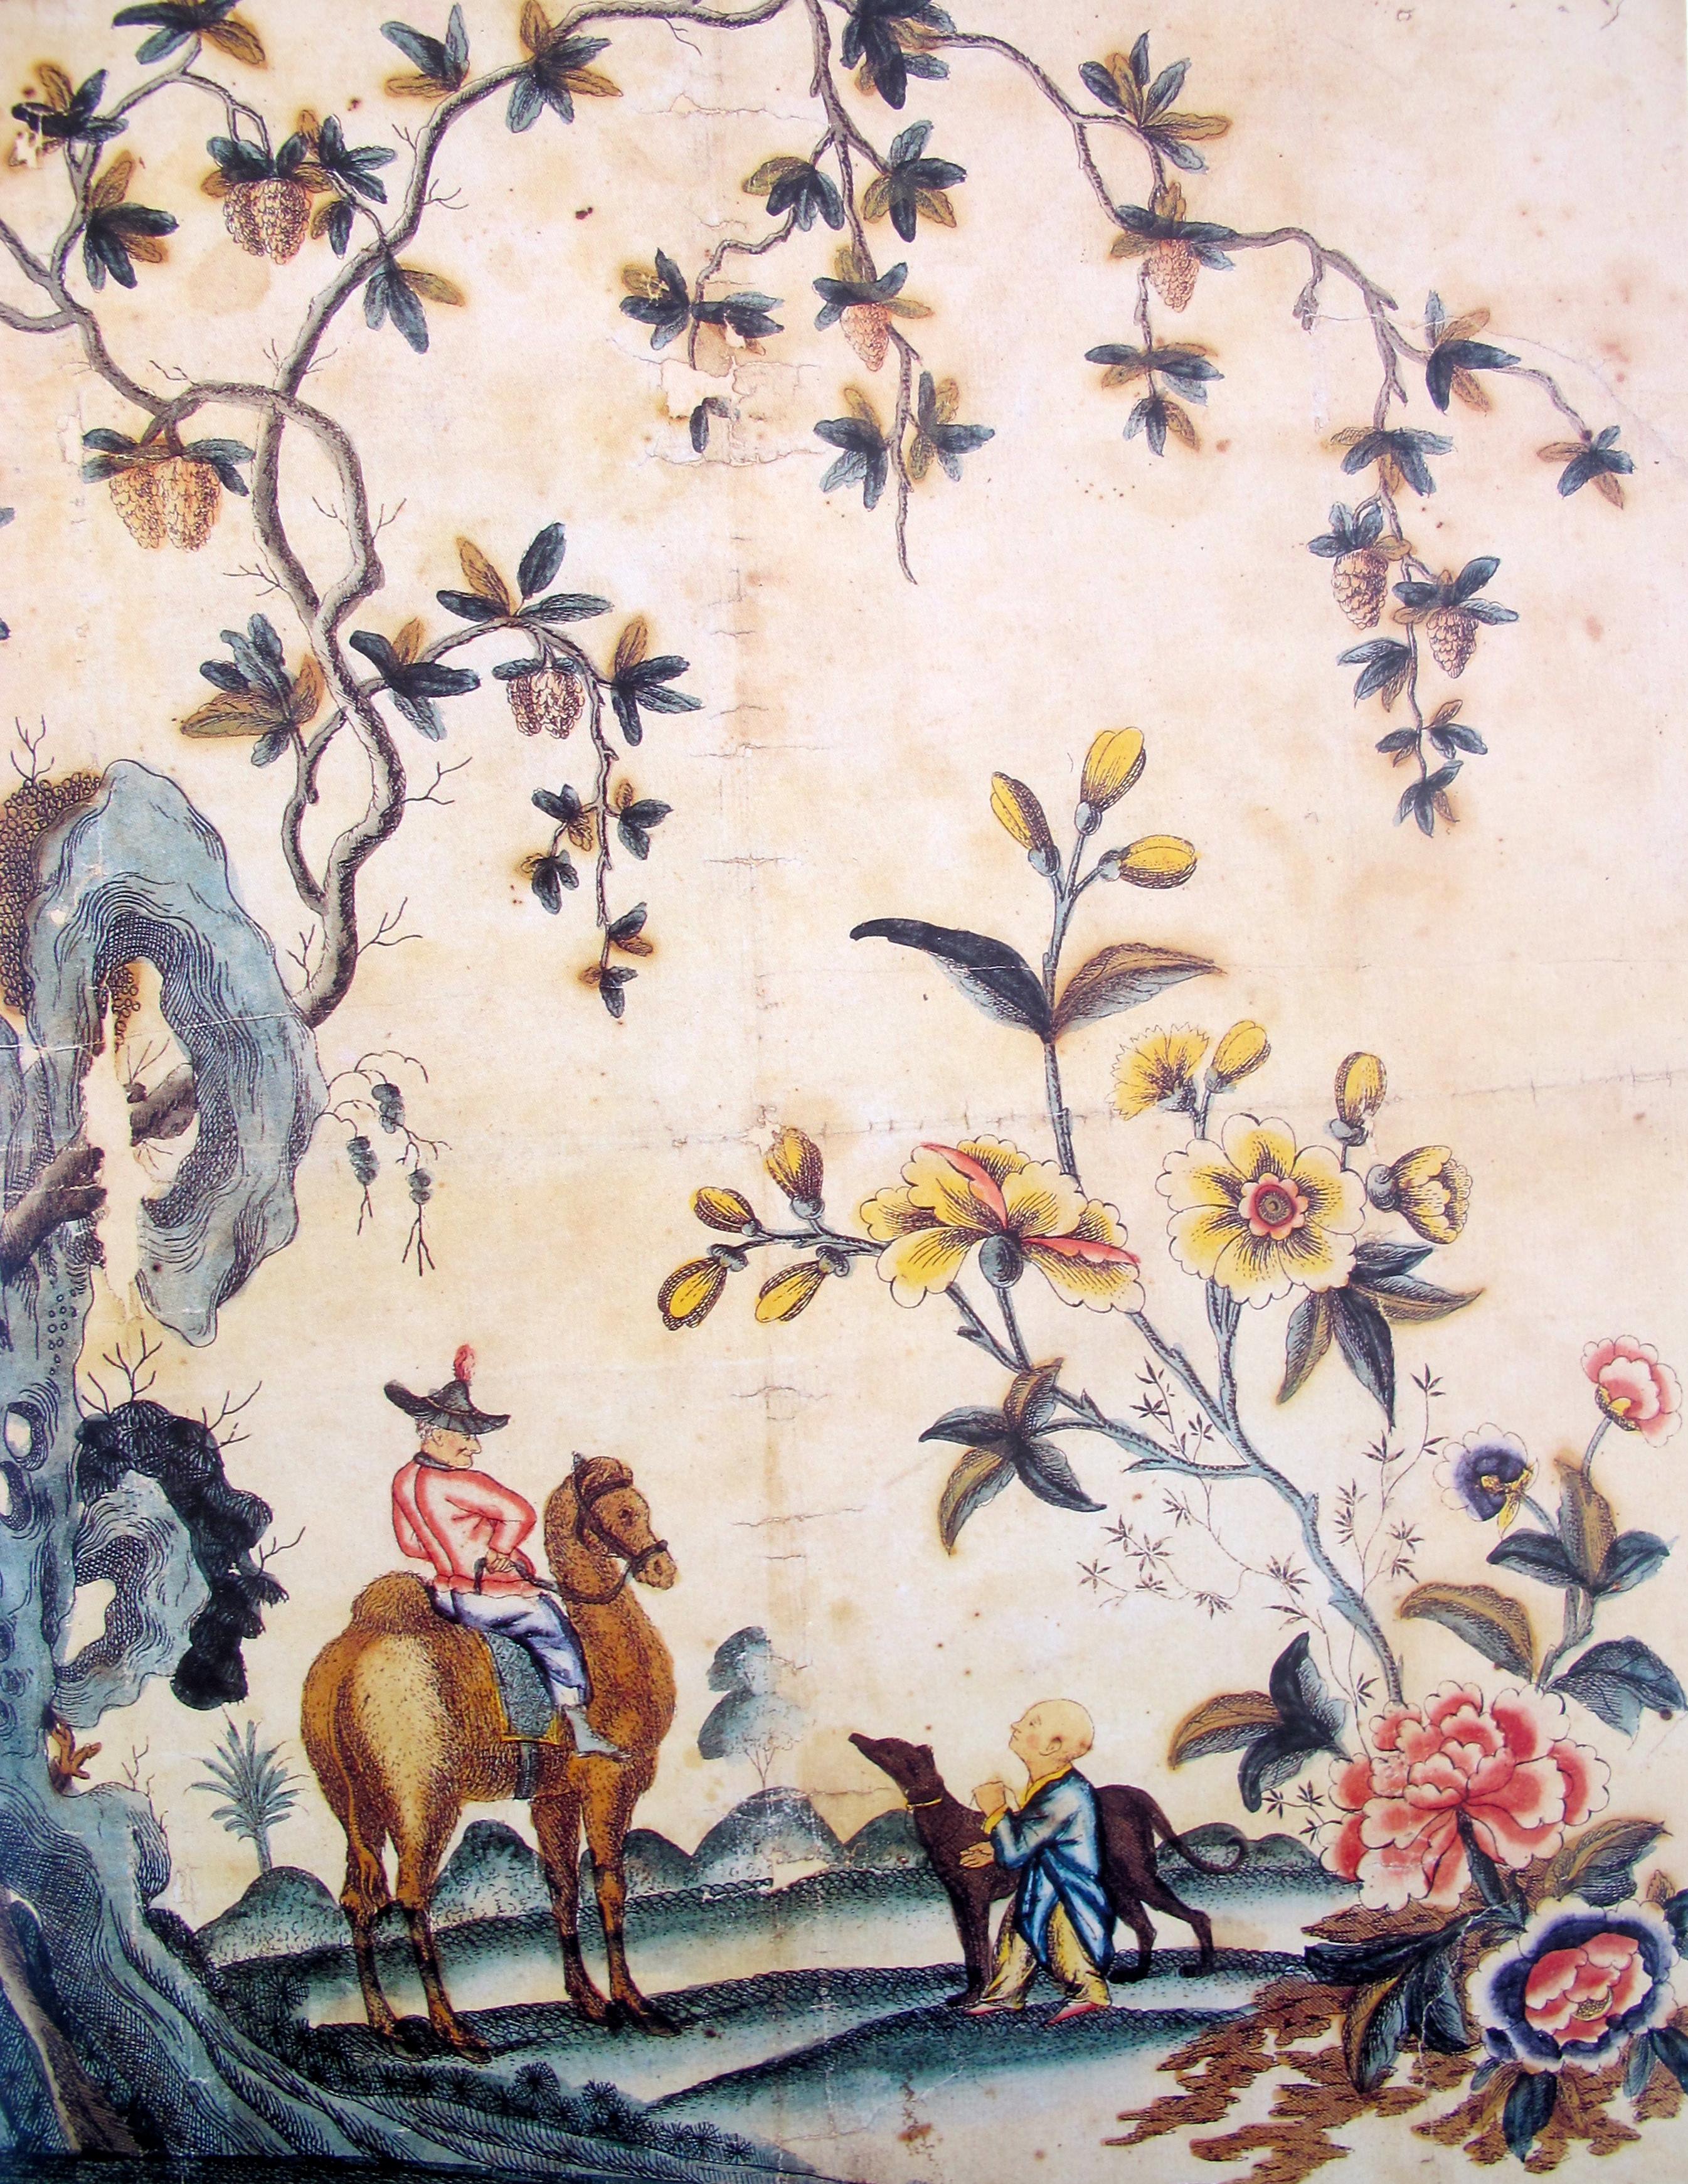 chinoiserie wallpaper 1770 English 2691x3481